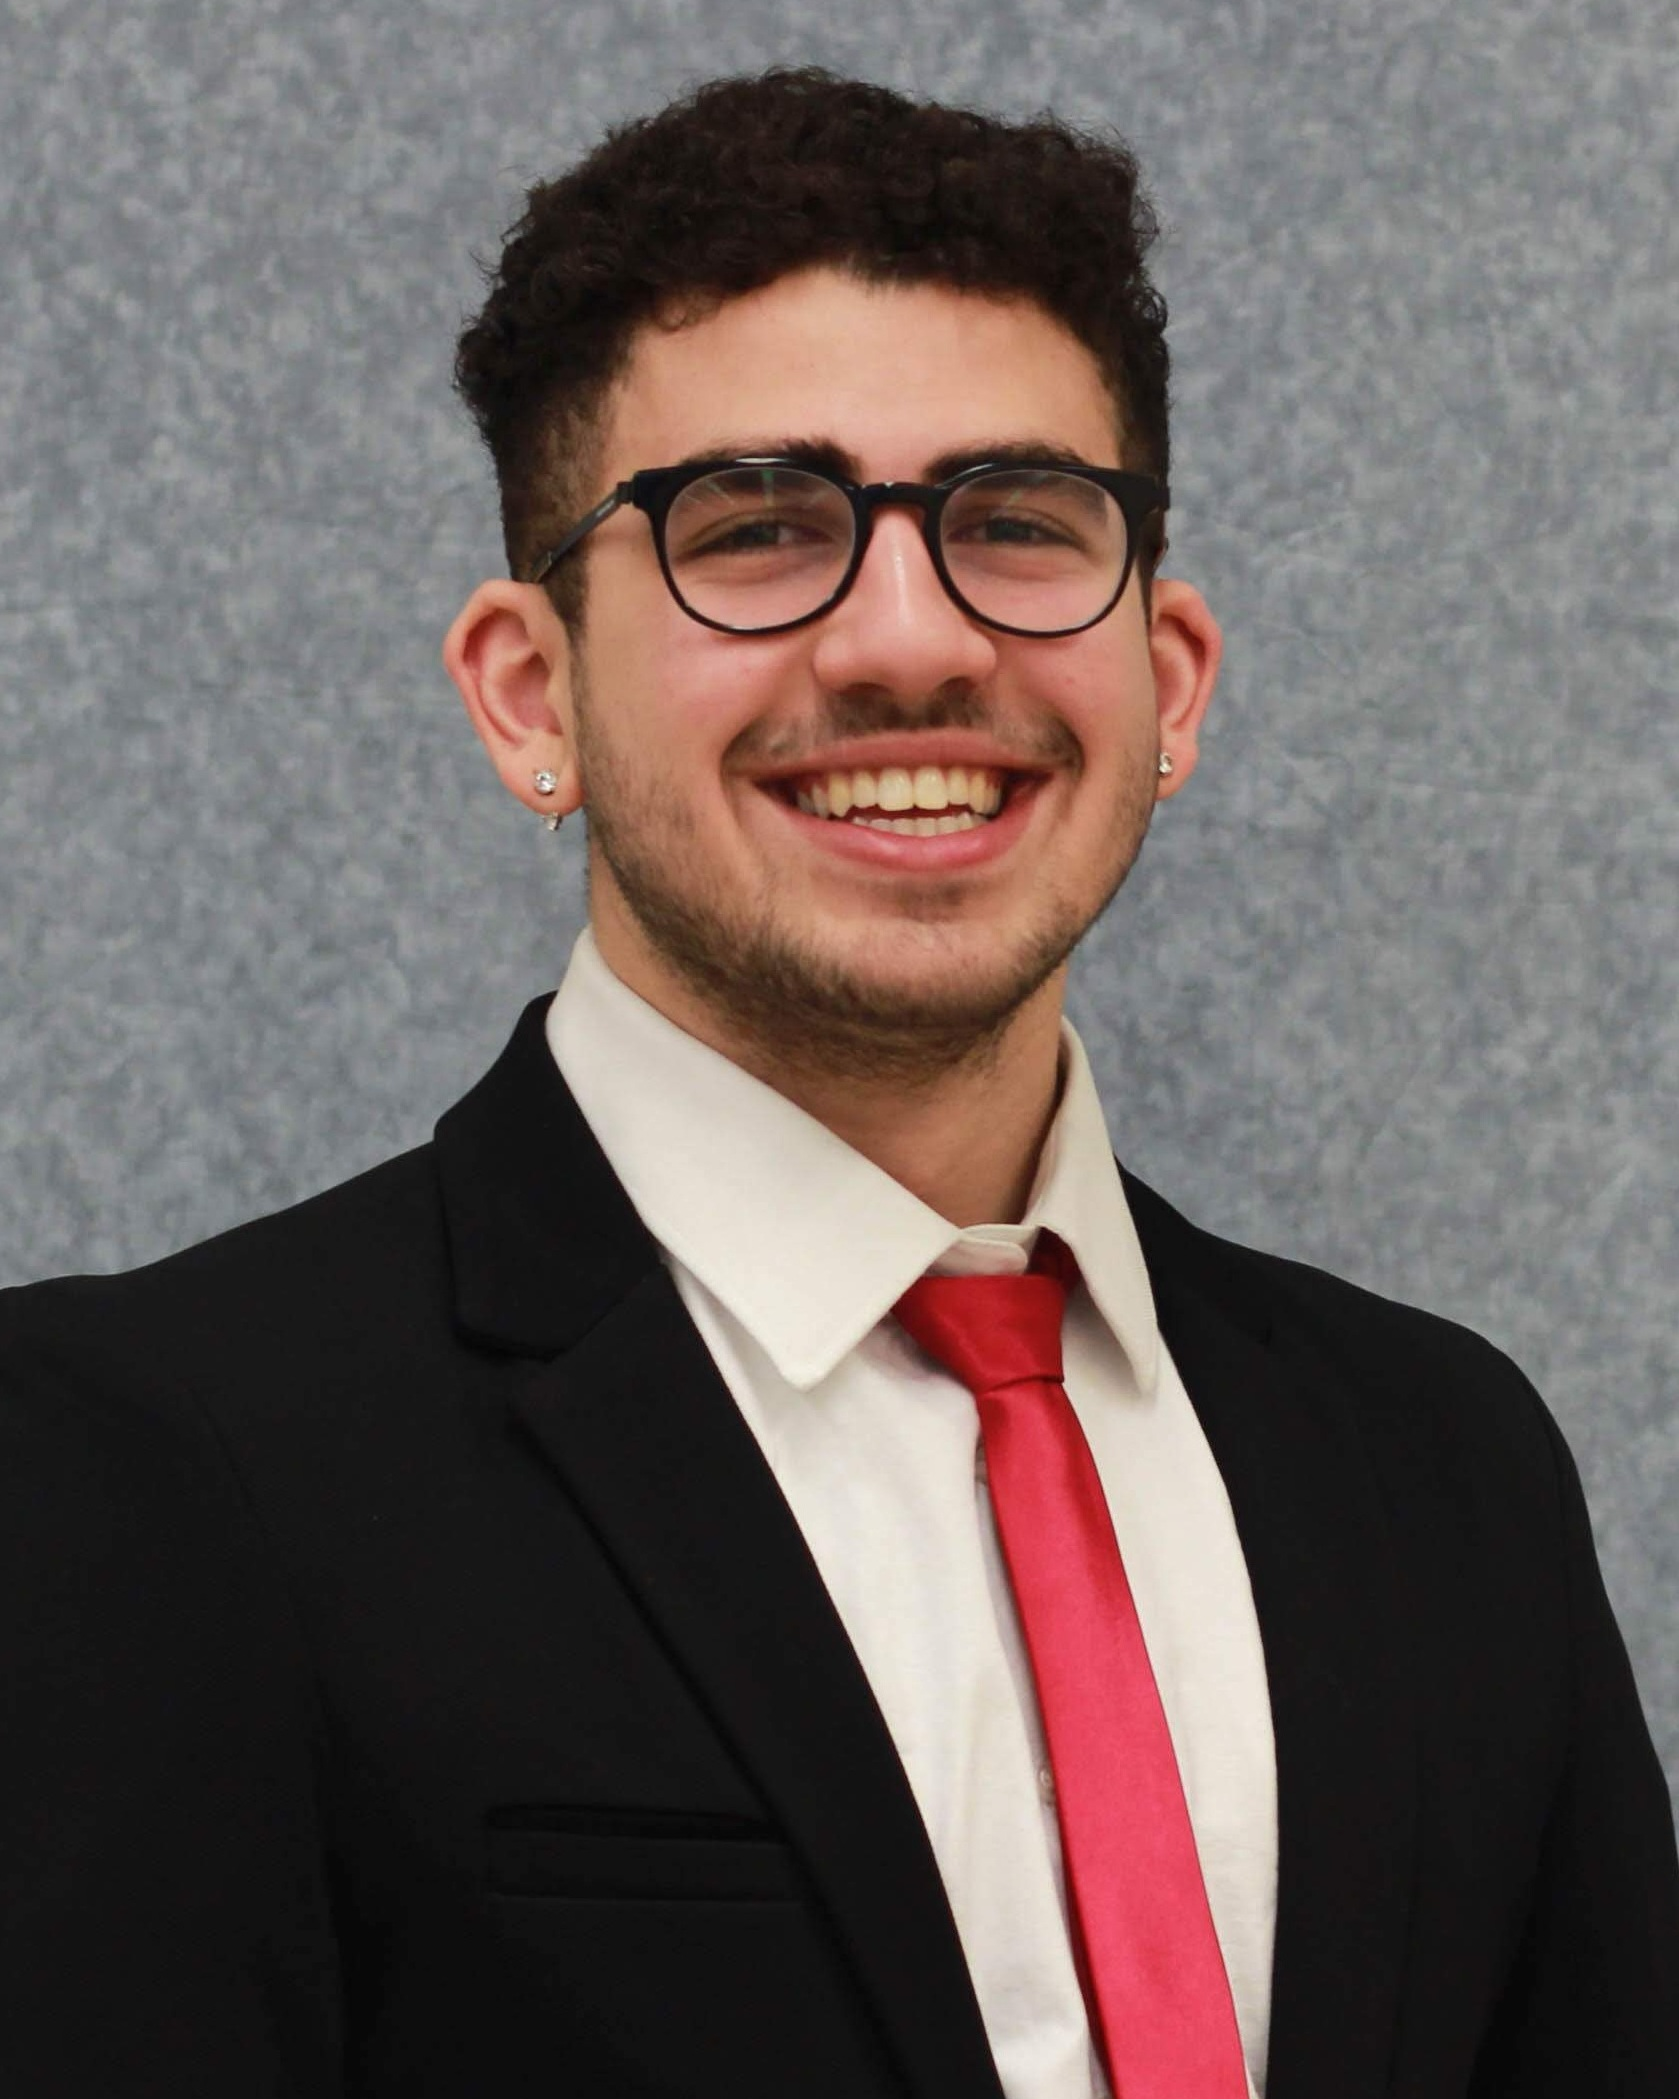 Ryan Hosseini - Academic Chair